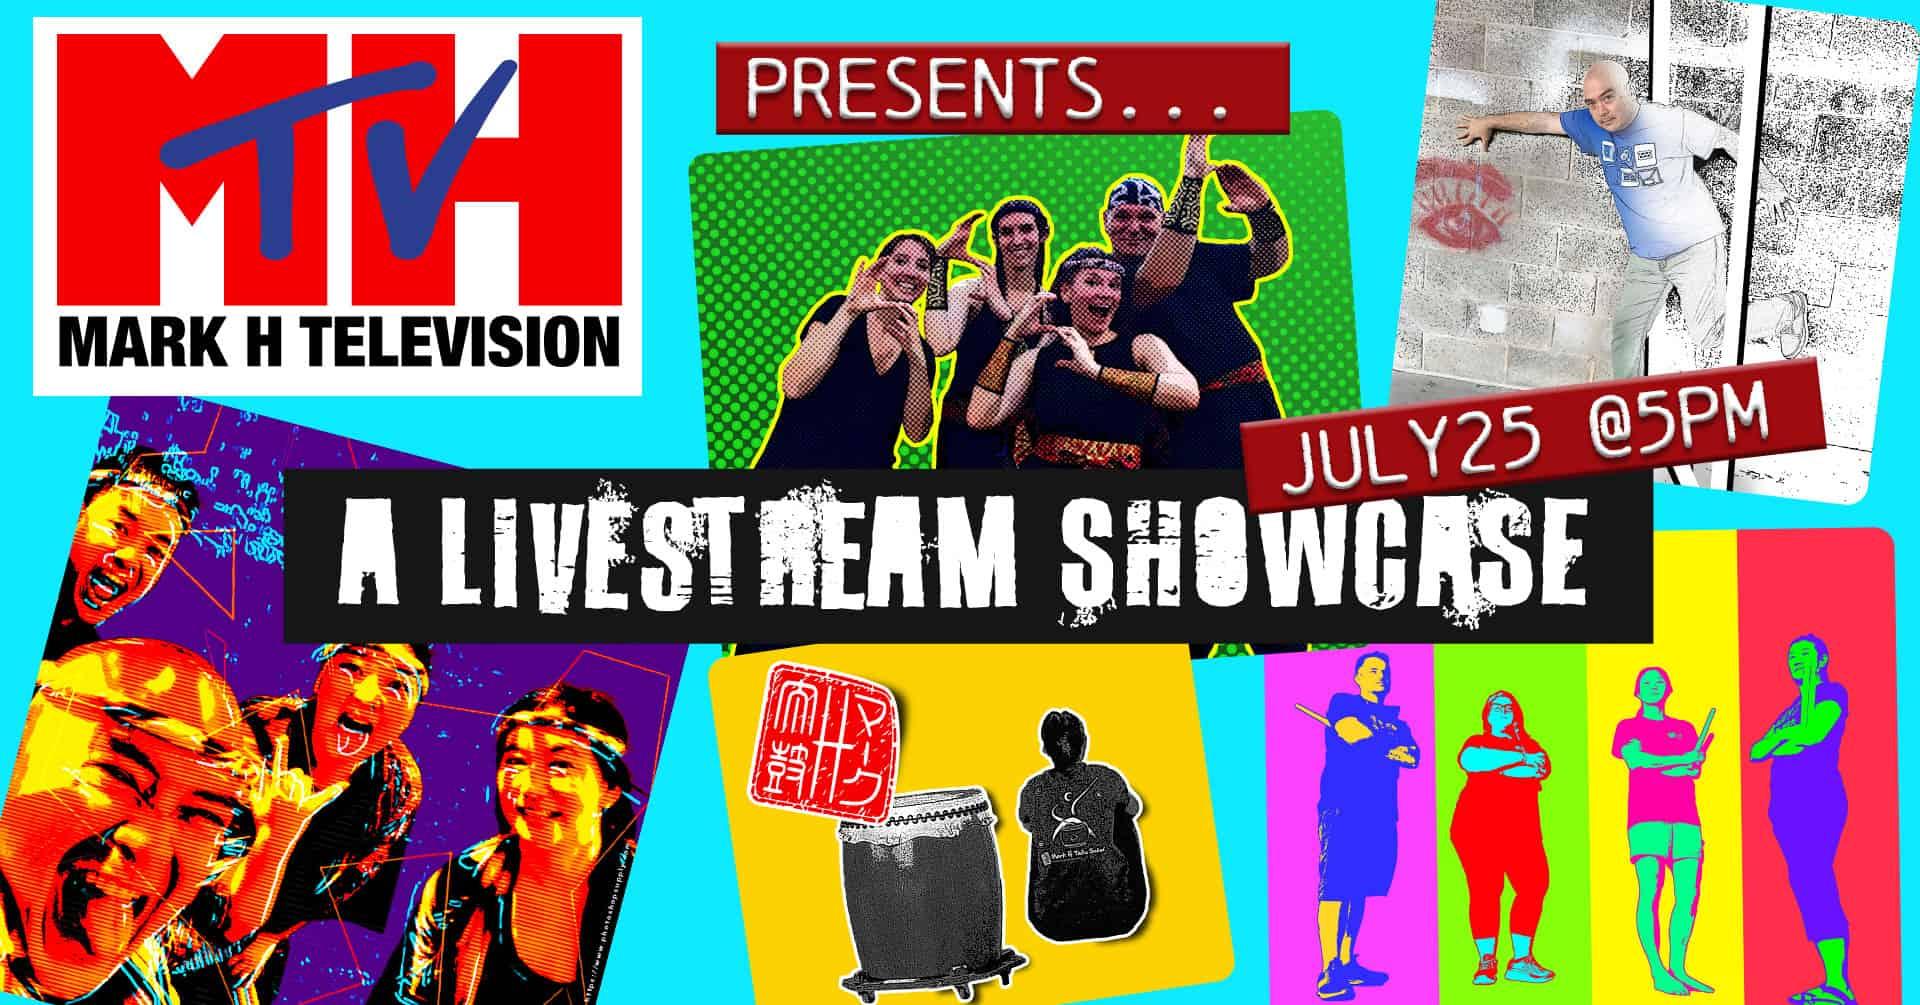 MHTV presents